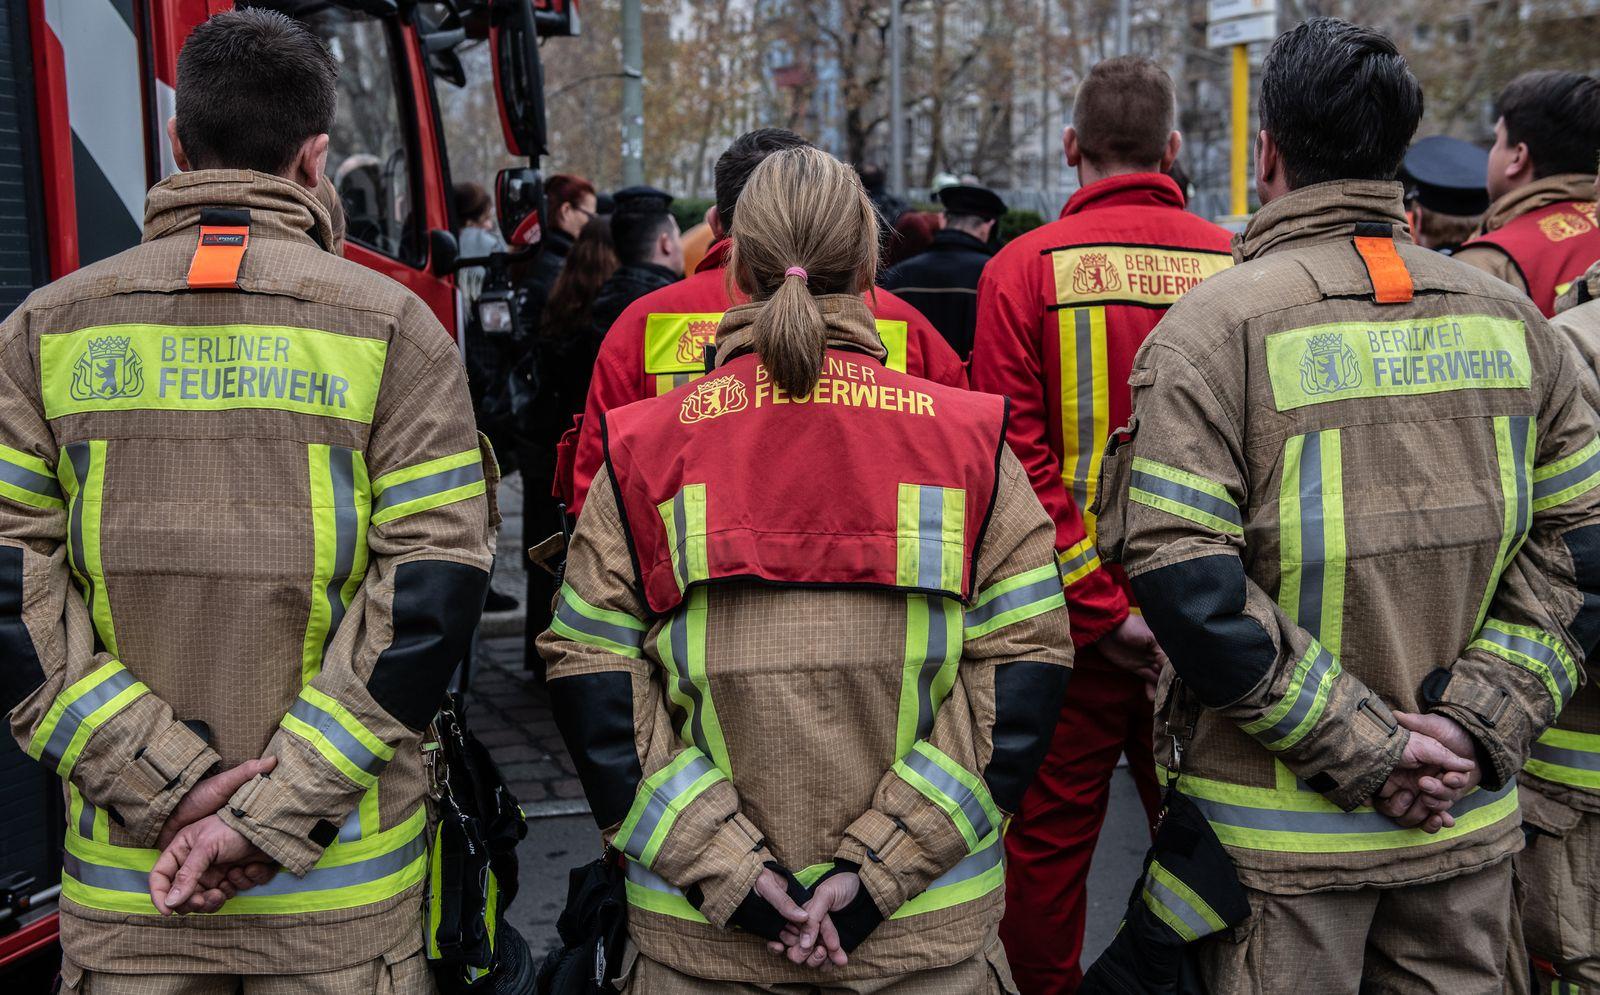 Gedenken an verstorbene Feuerwehrleute